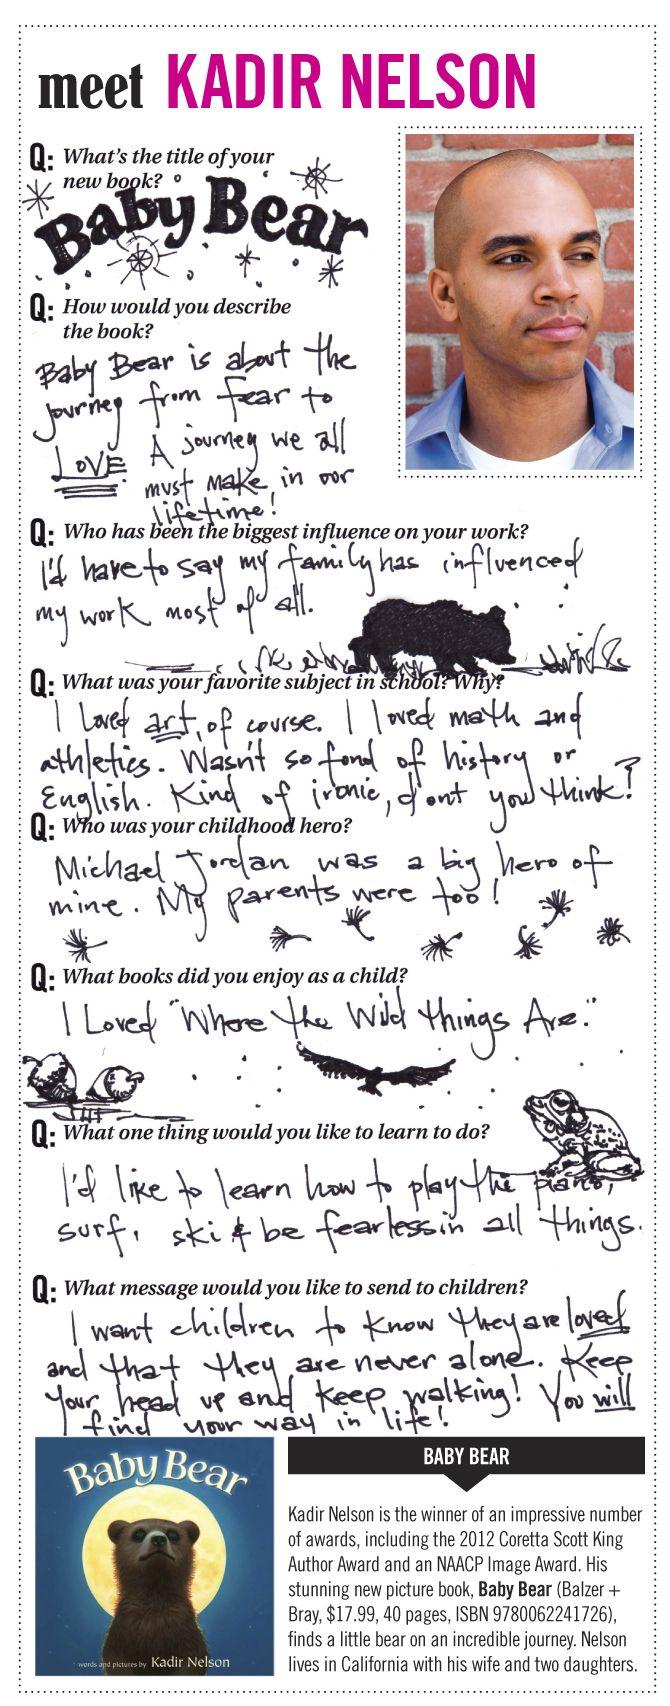 Meet Kadir Nelson, Authorillustrator Of Baby Bear!